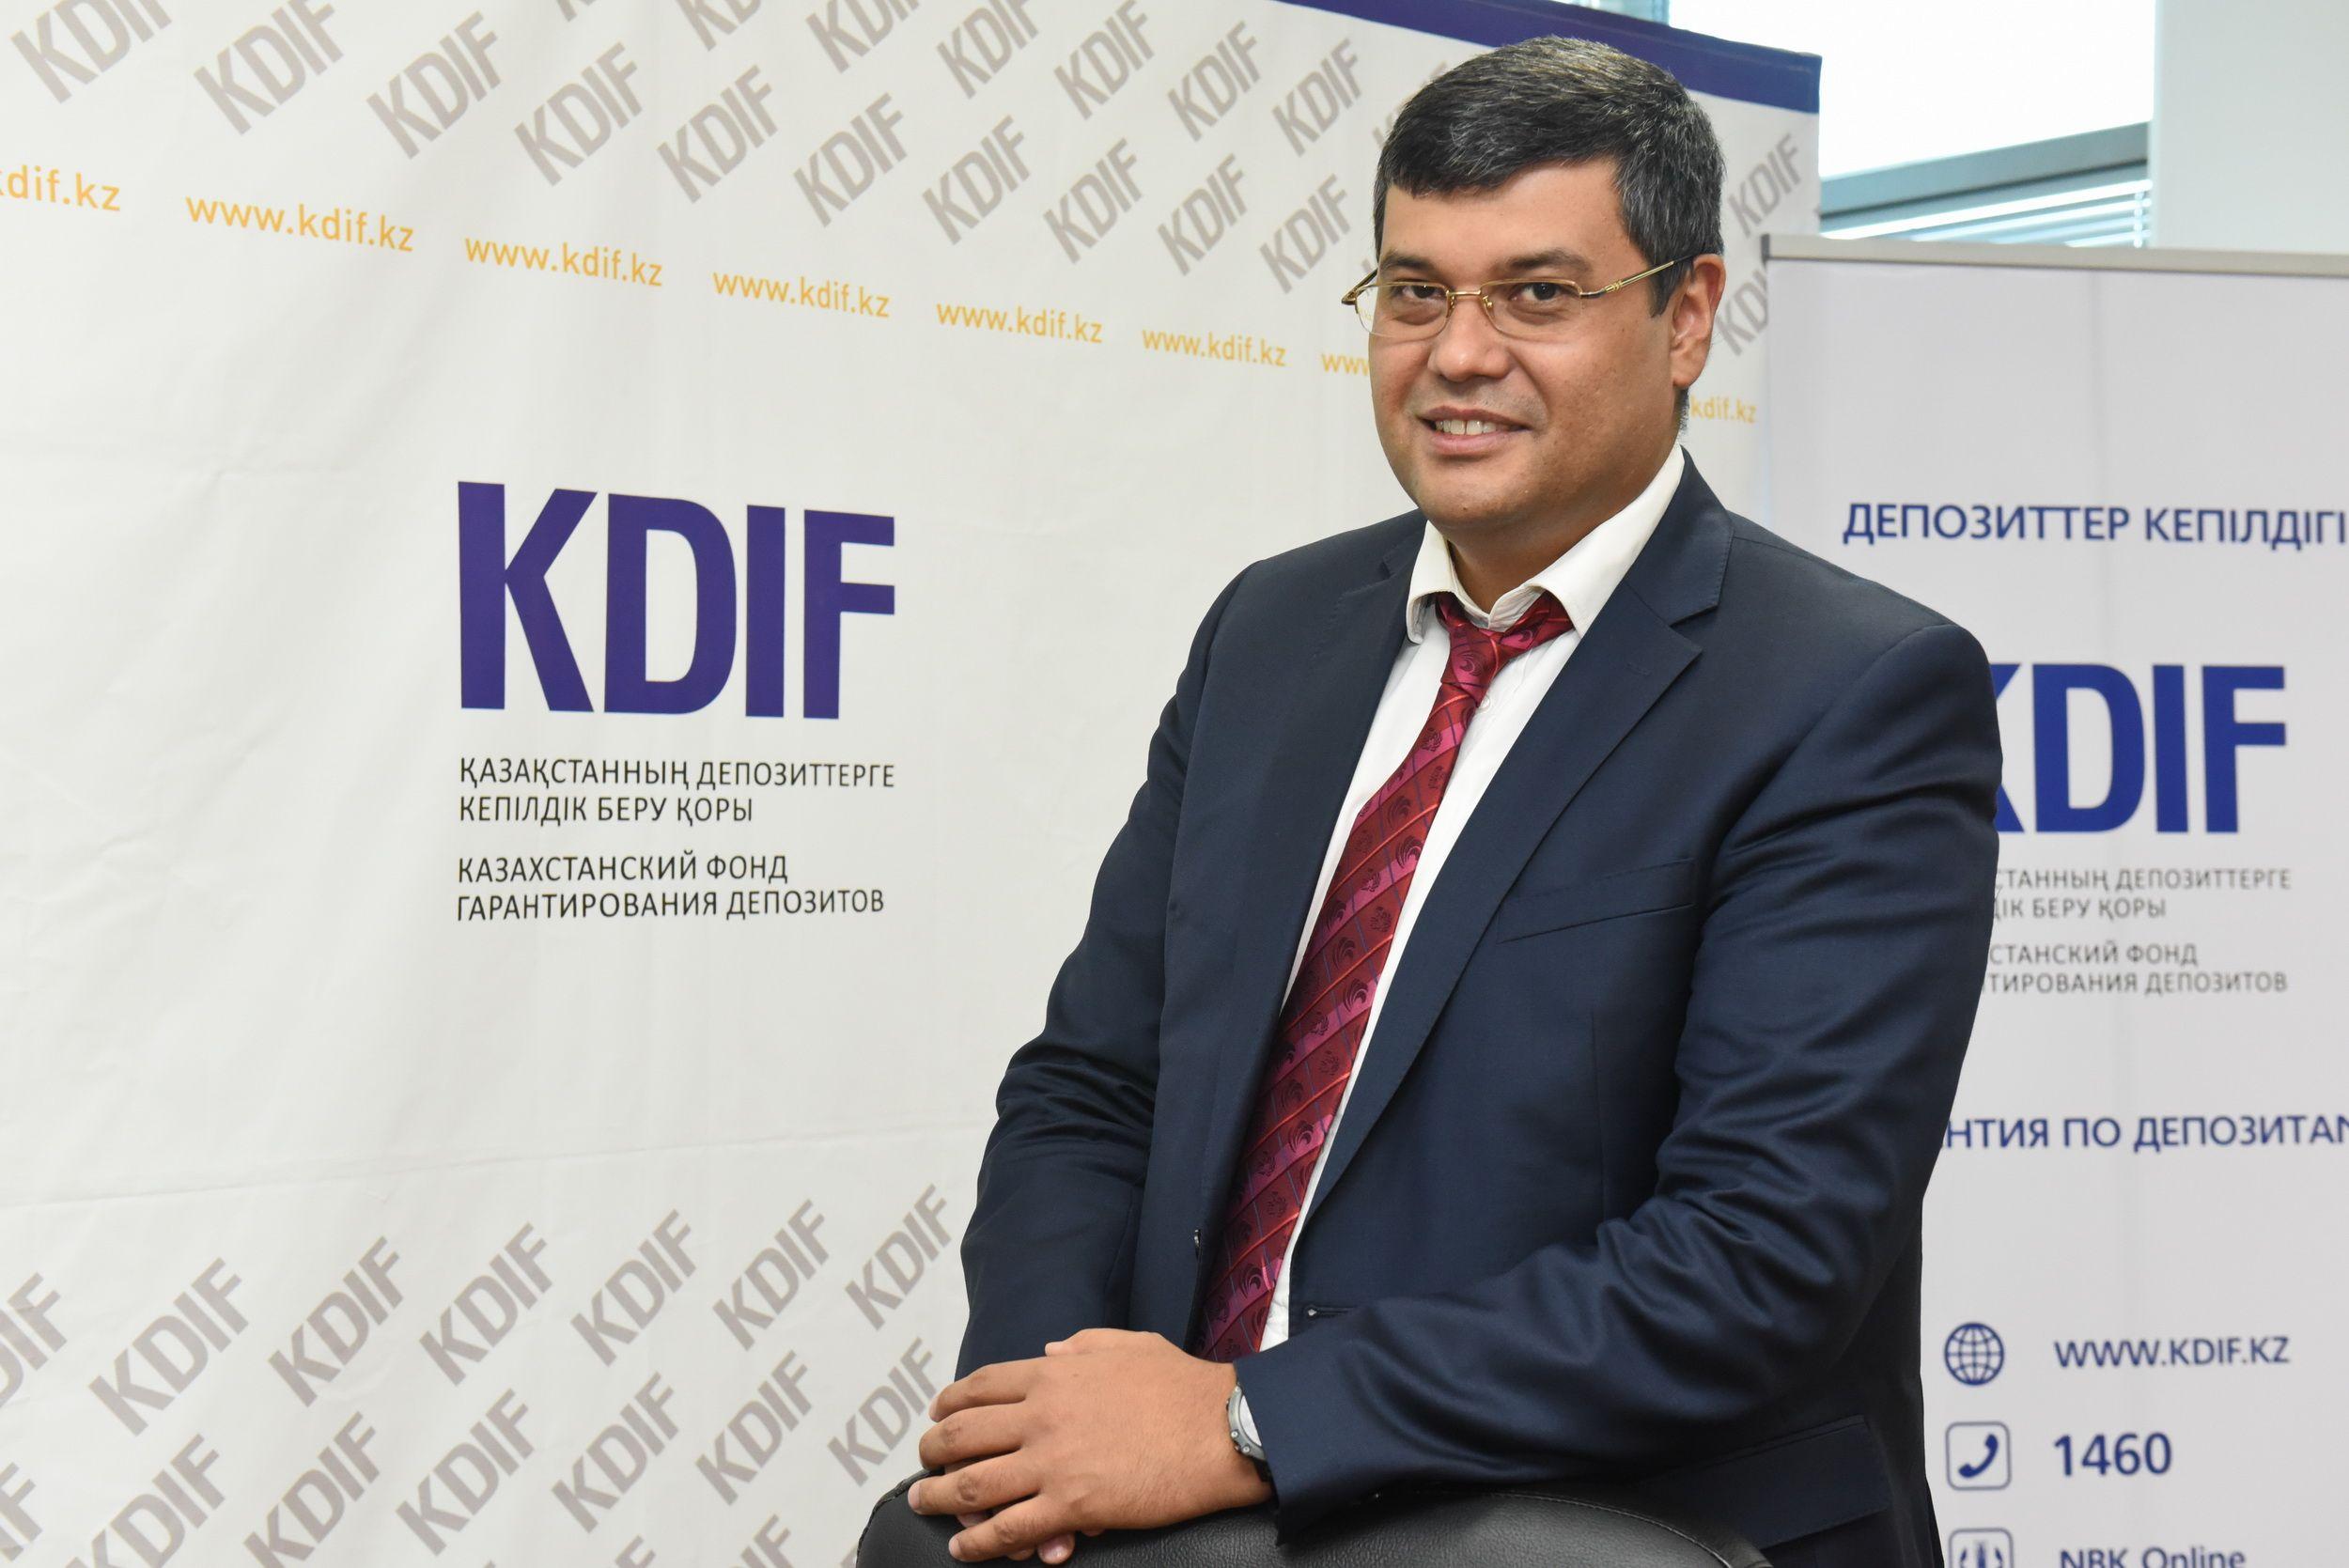 Акылжан Баймагамбетов: Мы отражаем ту ситуацию, которая складывается на рынке- Kapital.kz